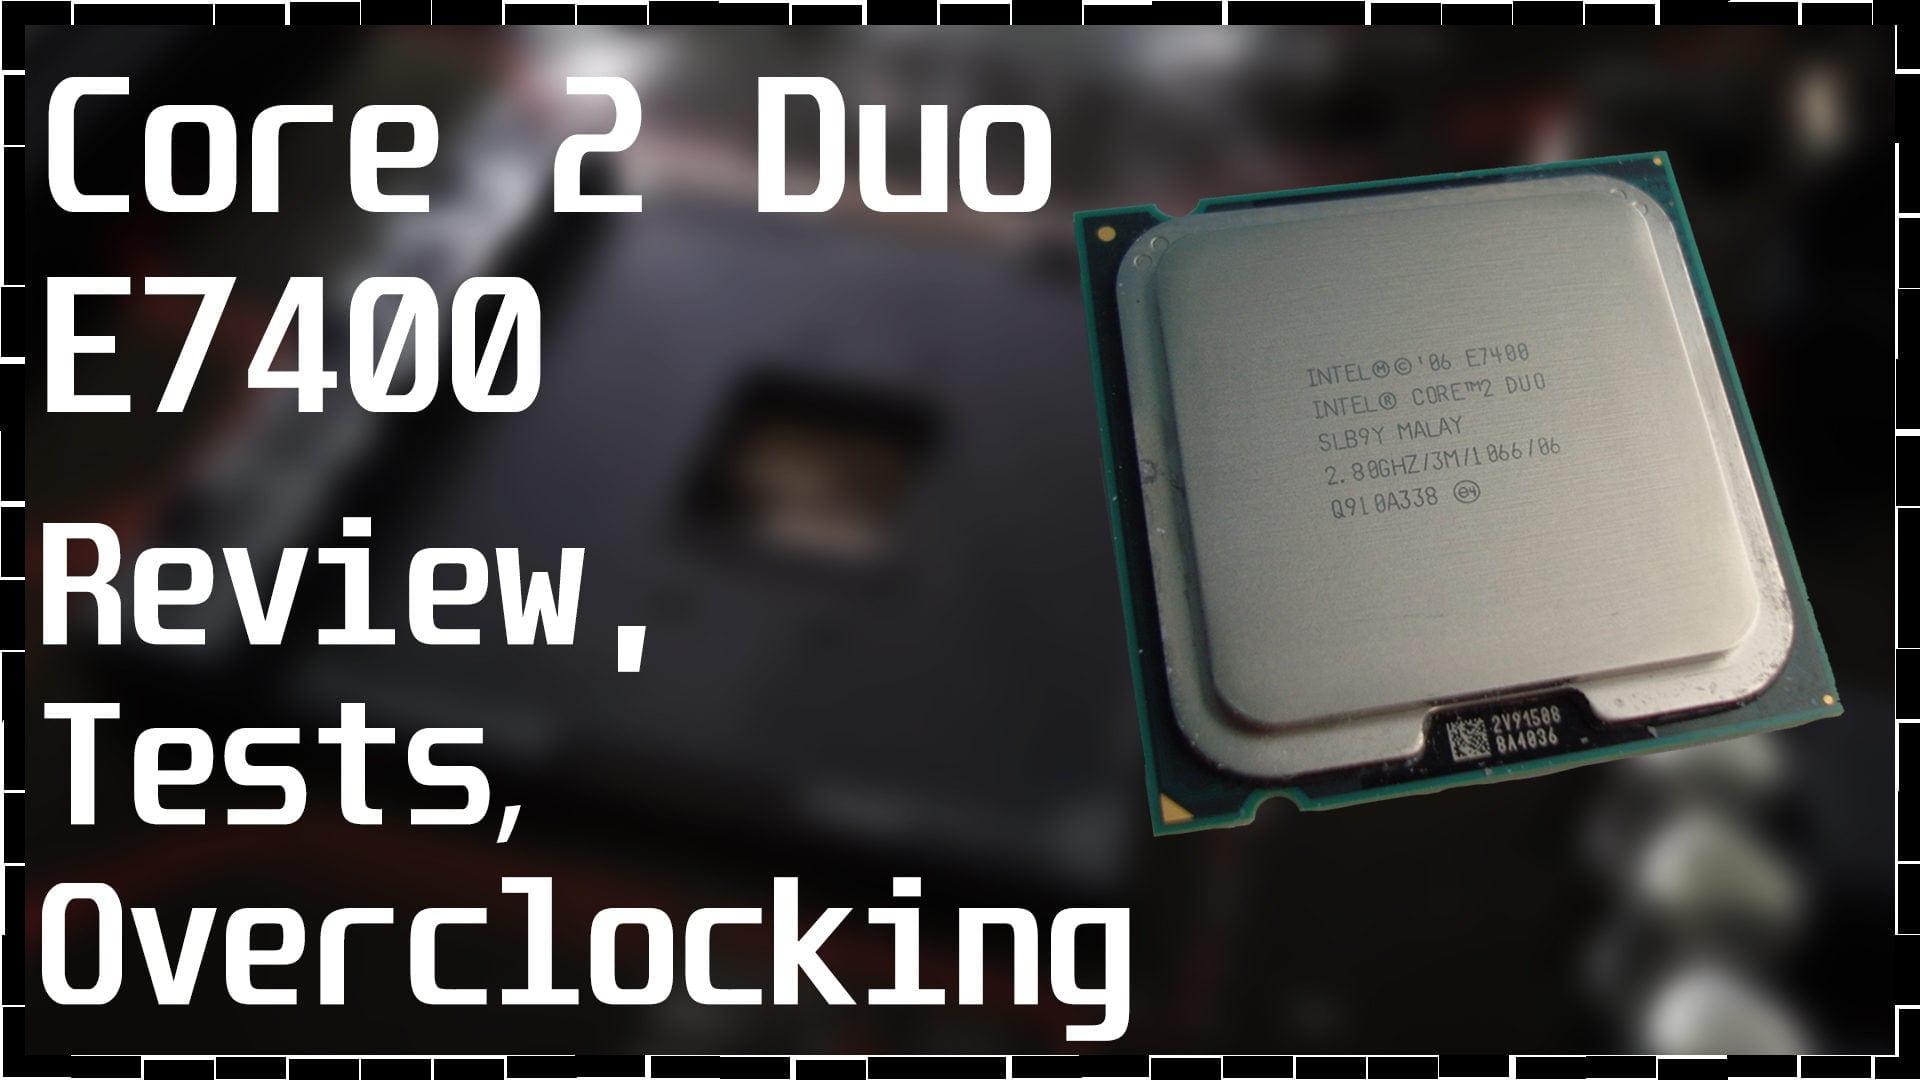 Intel Core 2 Duo E7400: Обзор, тесты и разгон